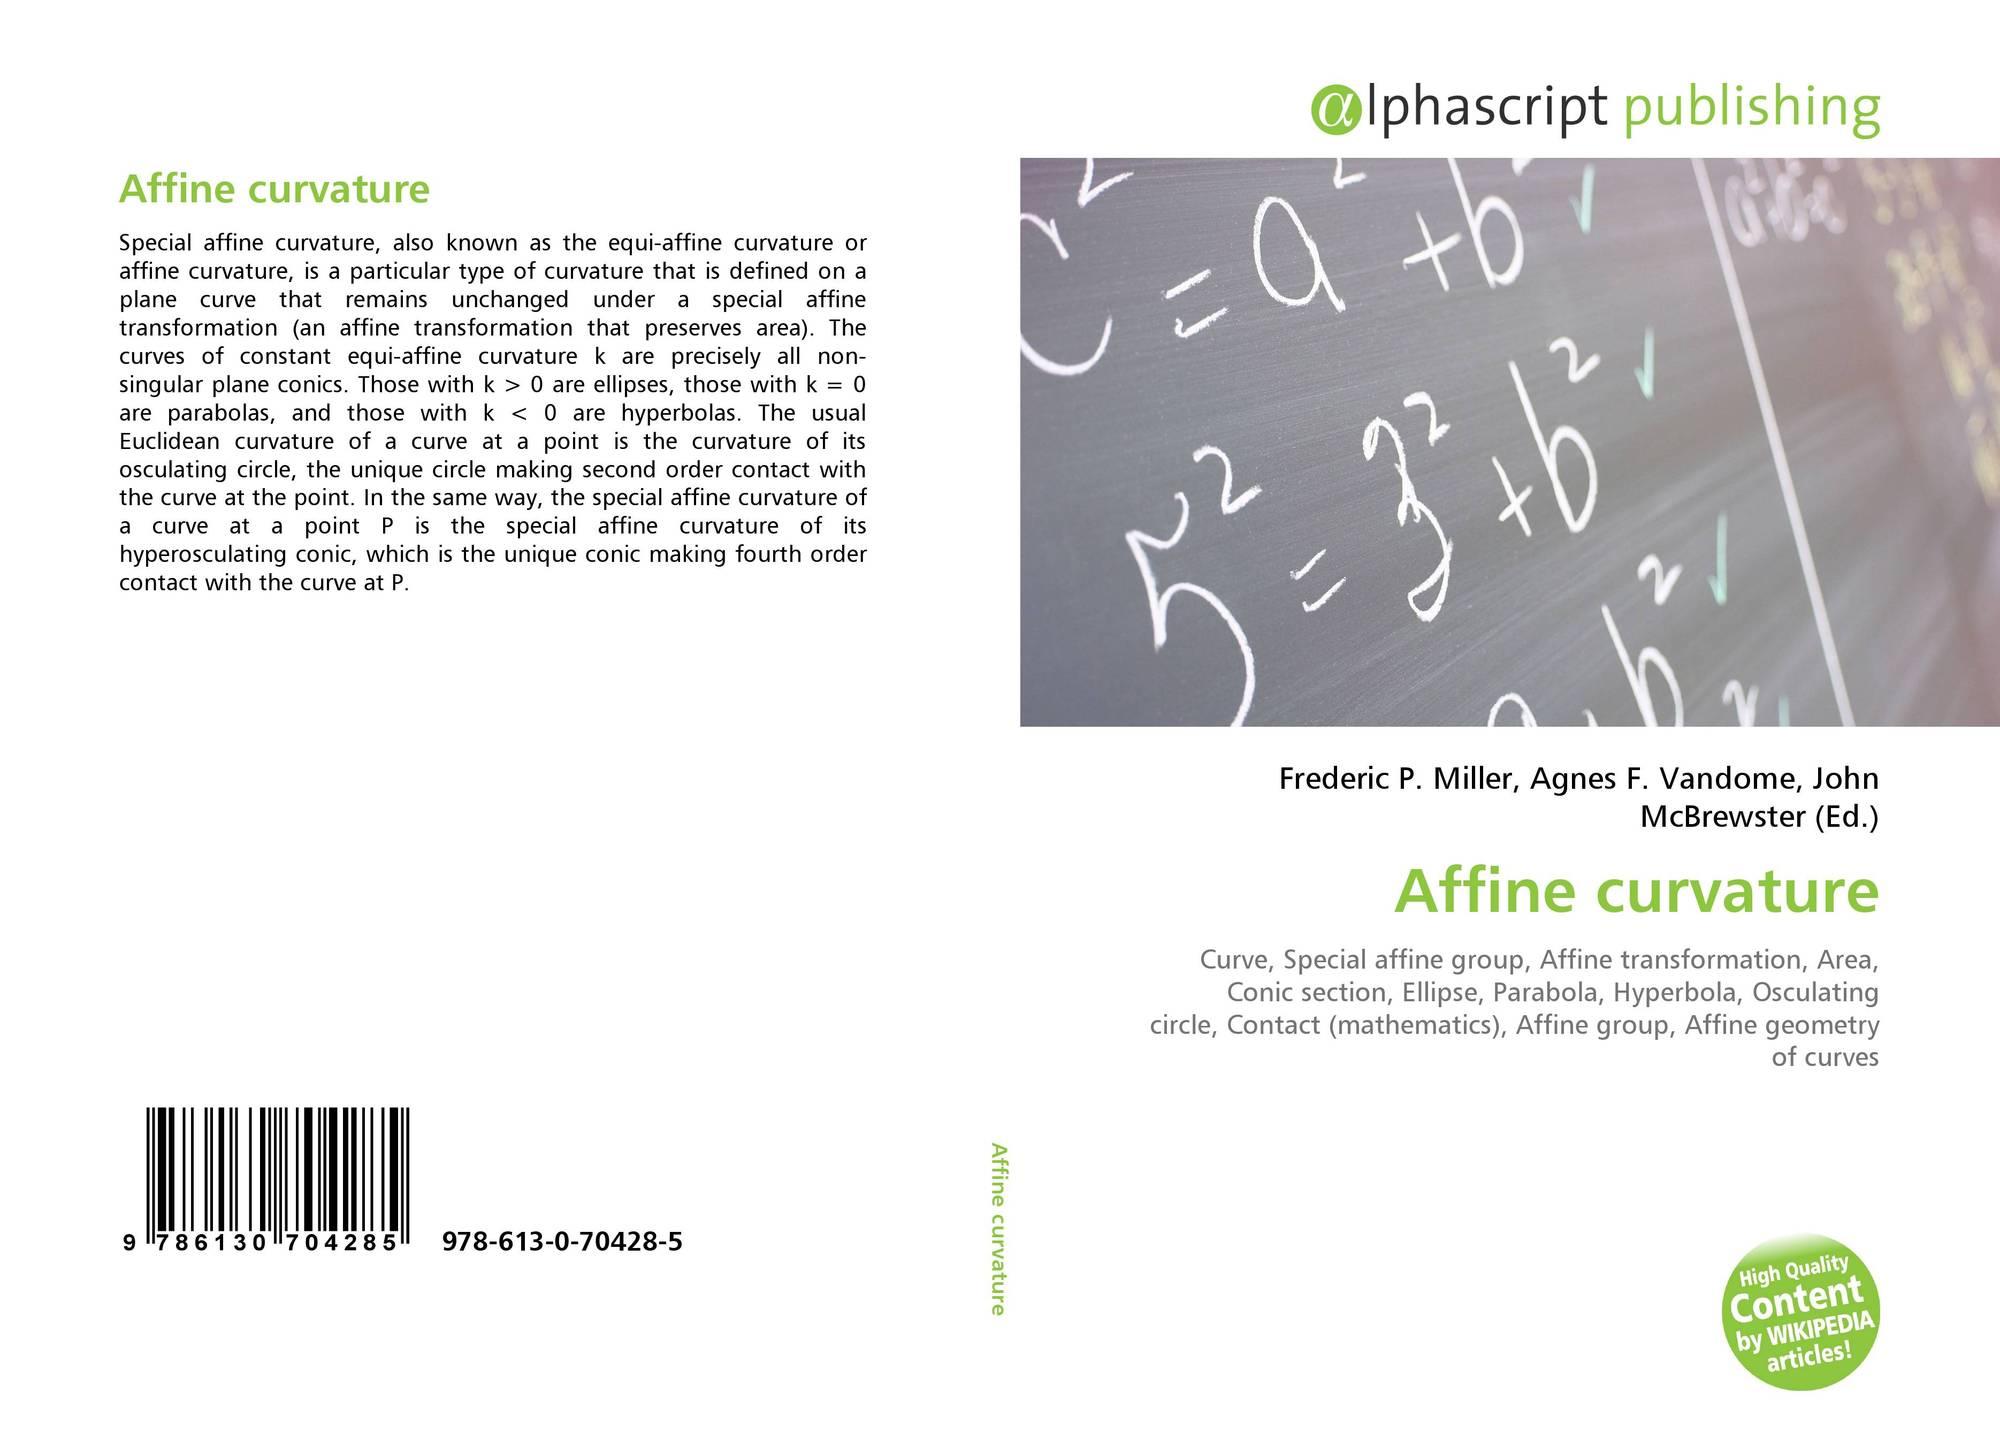 Affine curvature, 978-613-0-70428-5, 6130704283 ,9786130704285